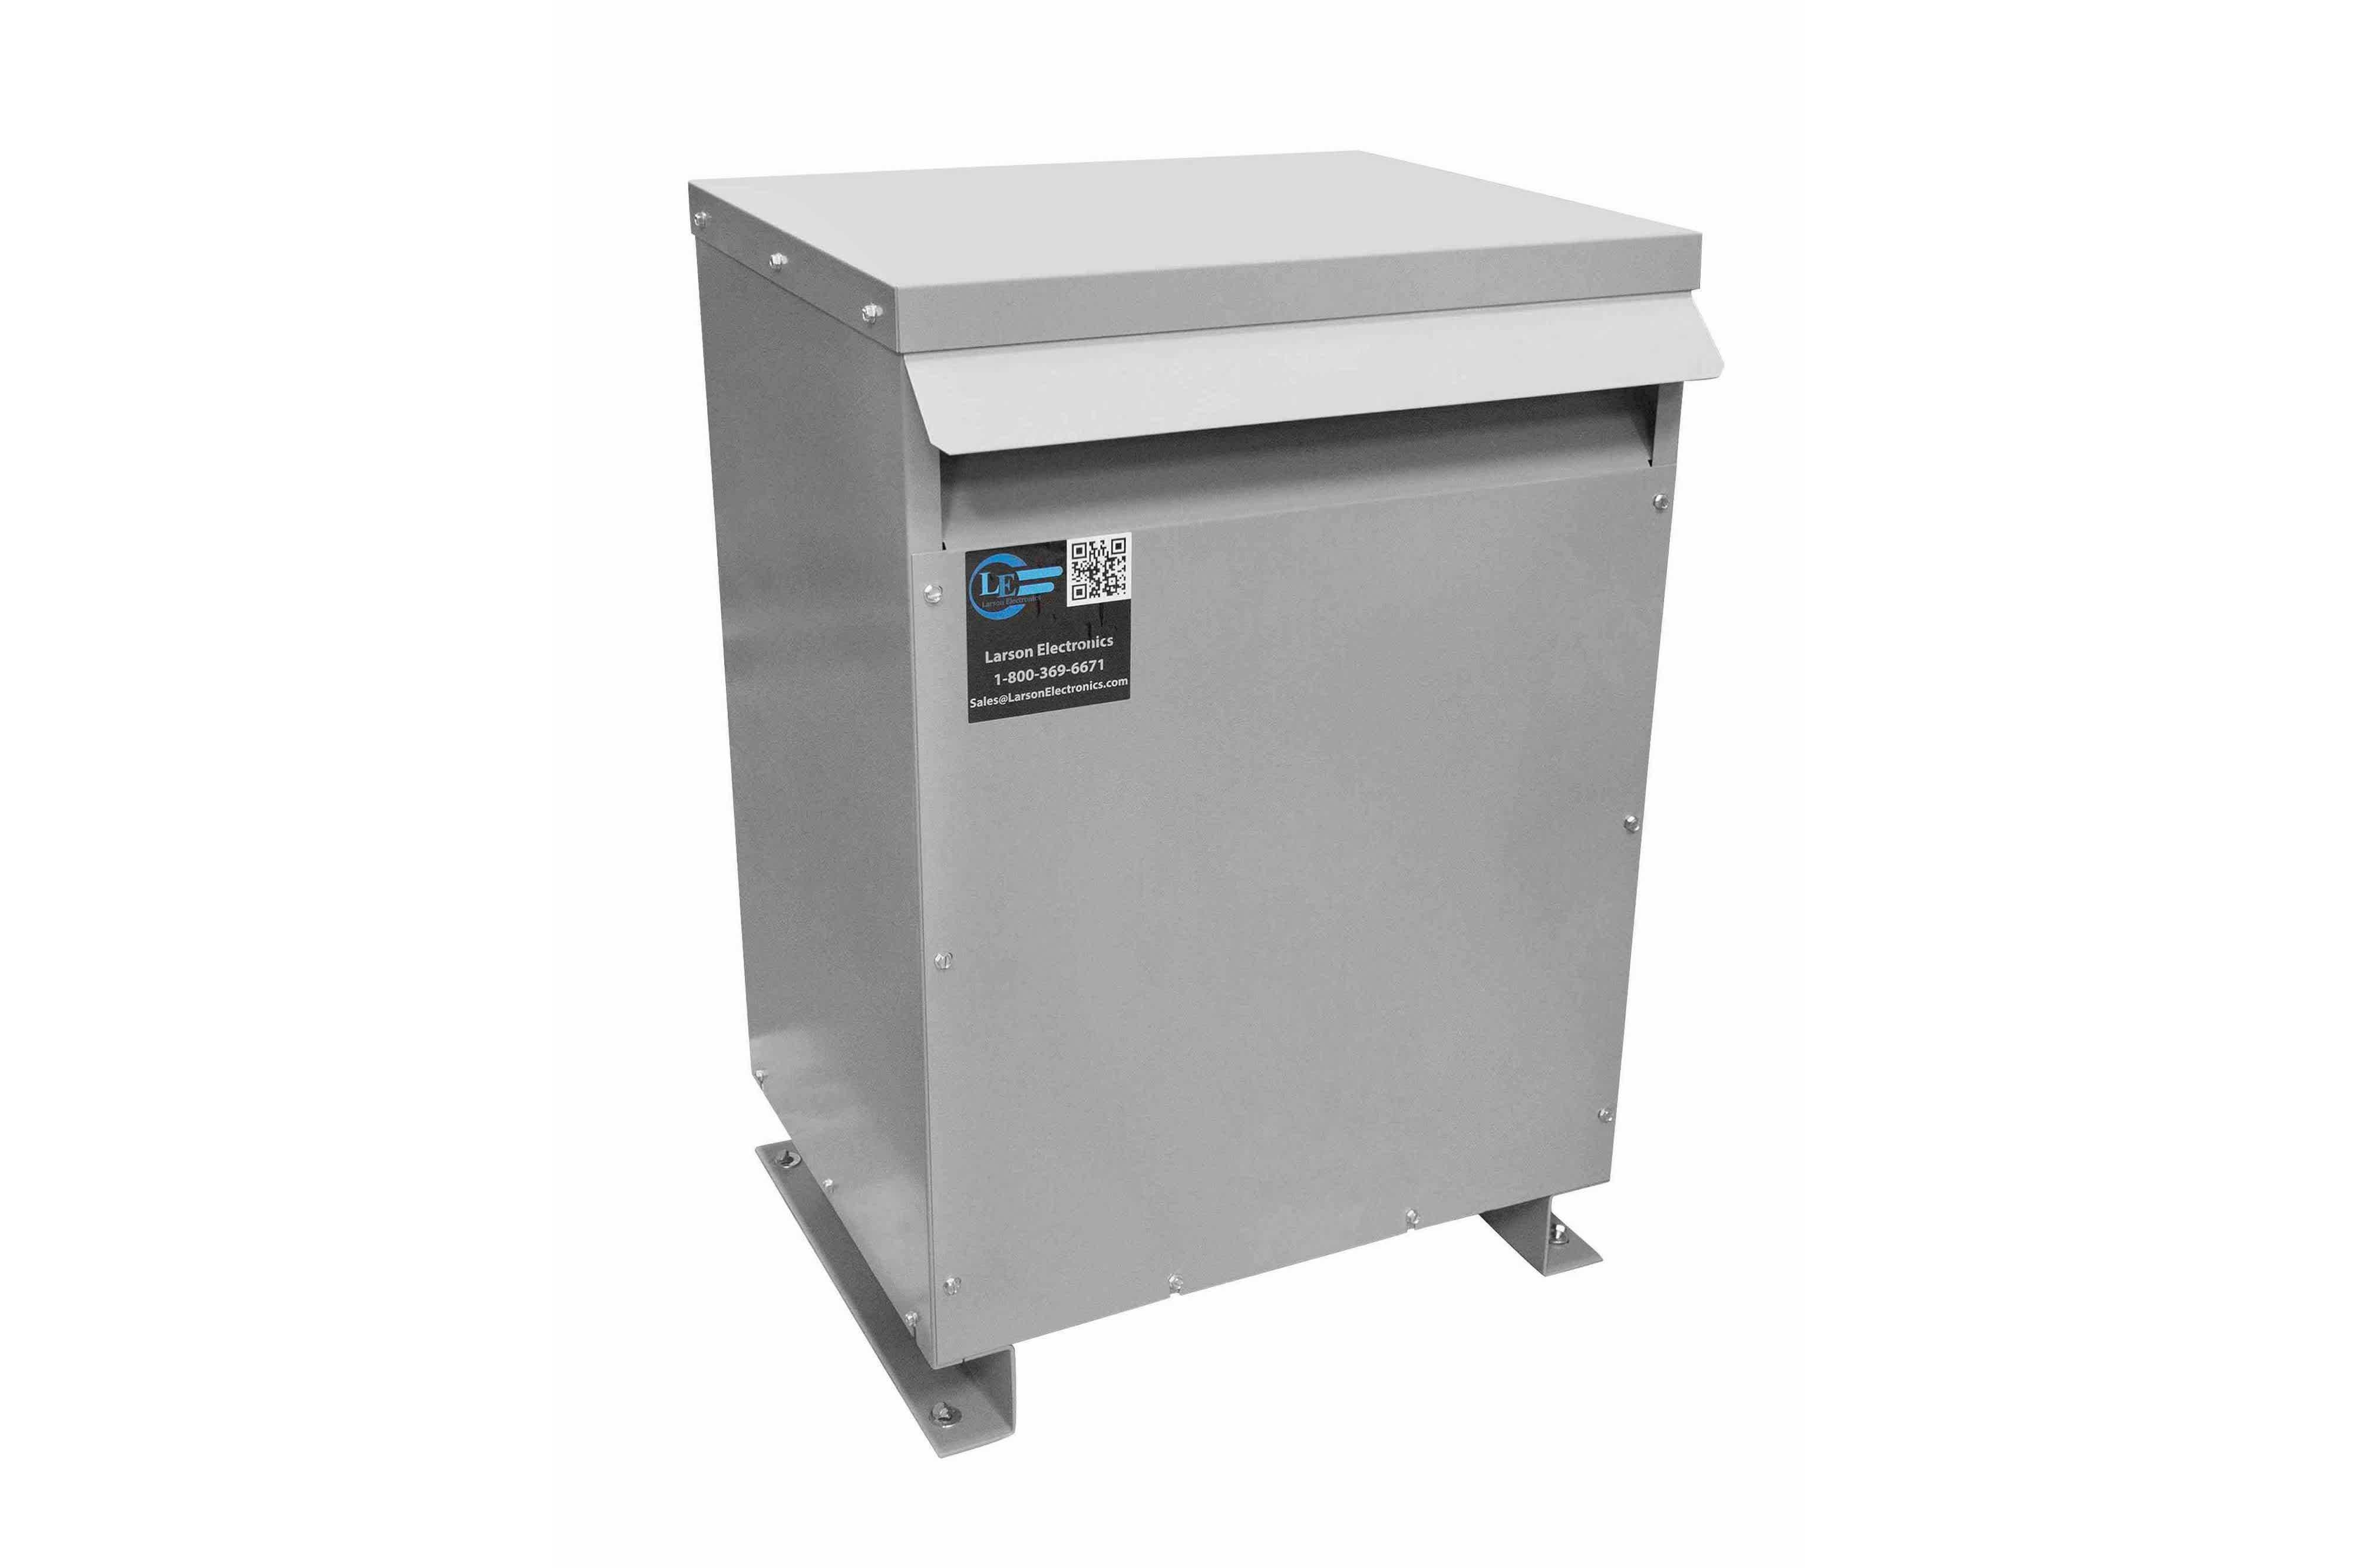 35 kVA 3PH Isolation Transformer, 220V Wye Primary, 208Y/120 Wye-N Secondary, N3R, Ventilated, 60 Hz